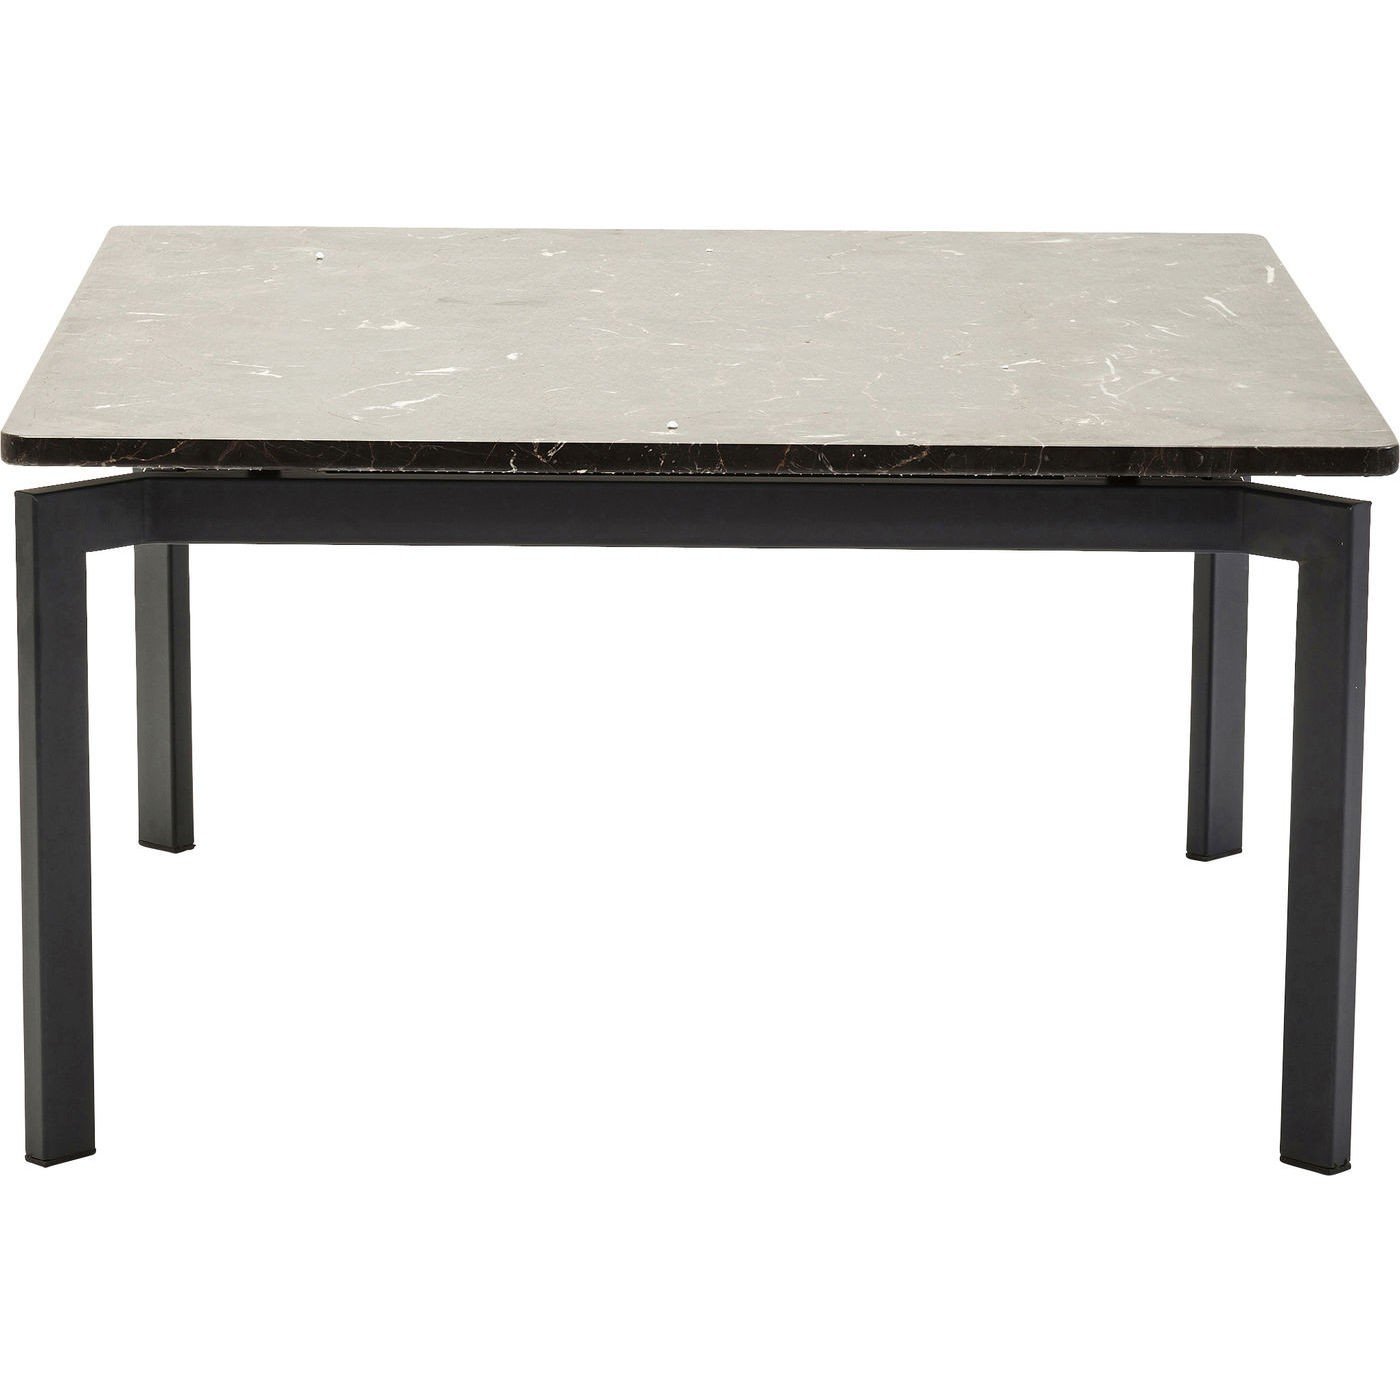 KARE DESIGN Soul sofabord - sort marmor, 80x80